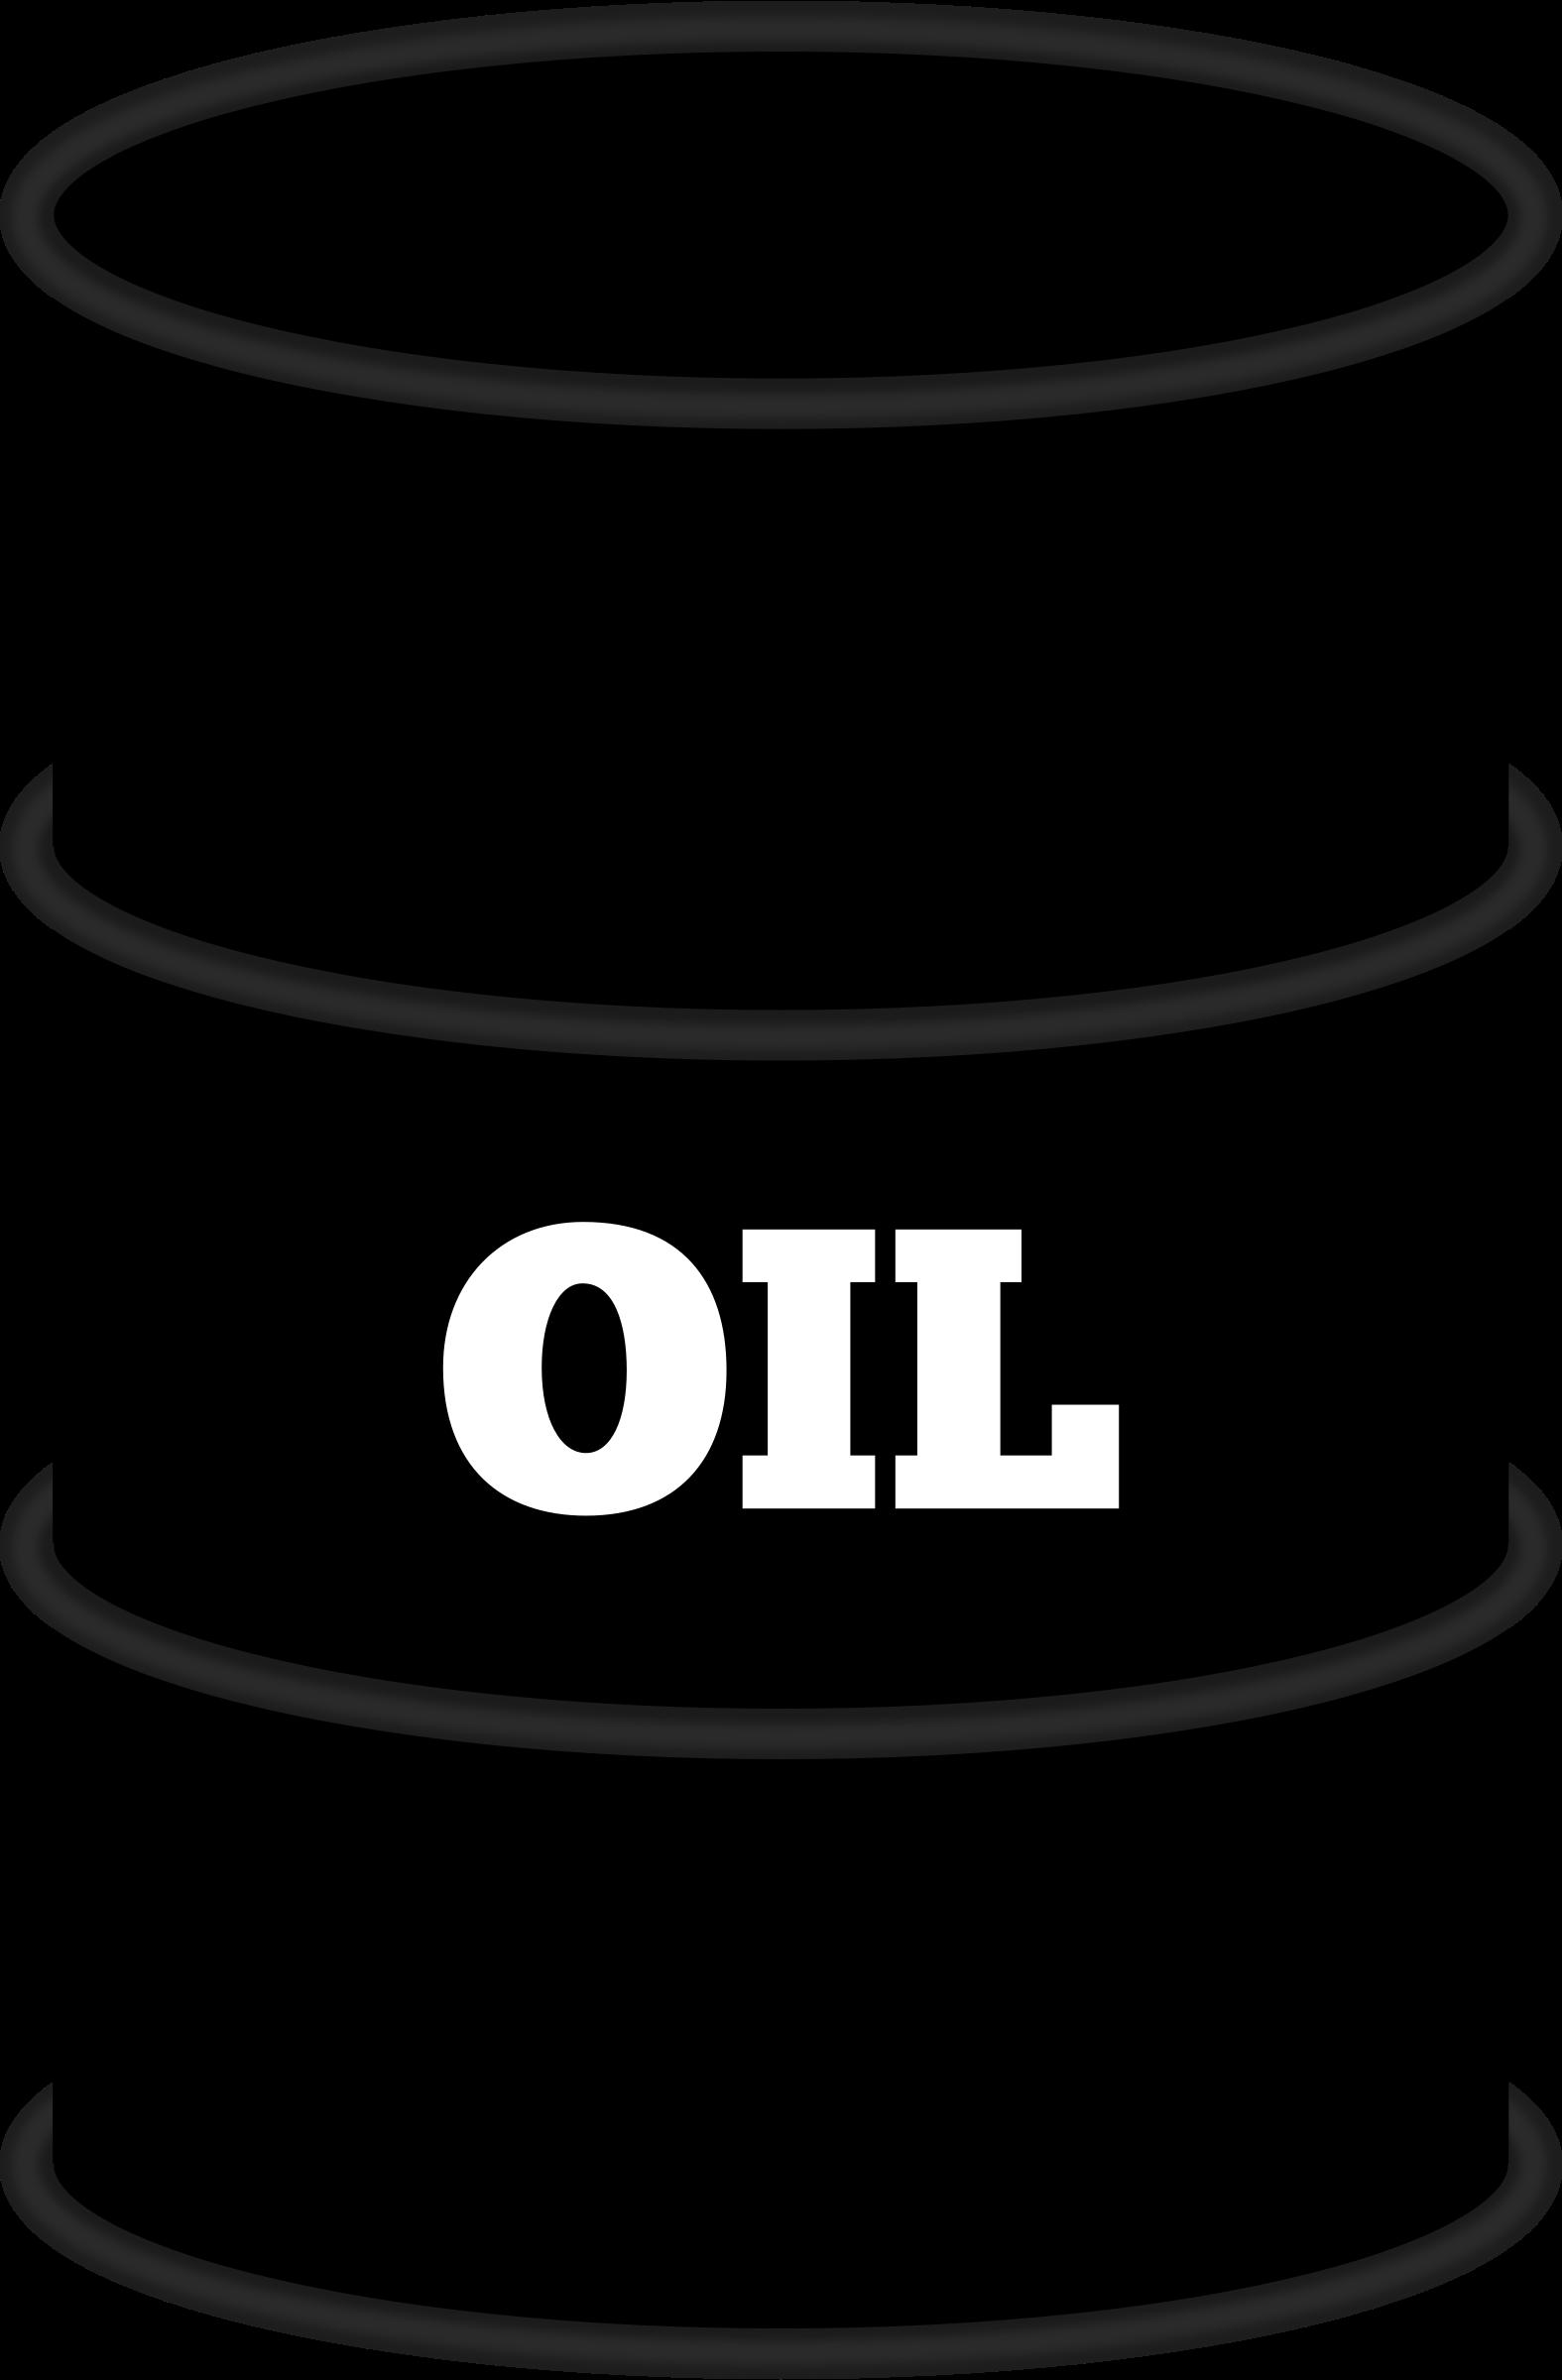 Oil clipart zeeton. Transparent background free on